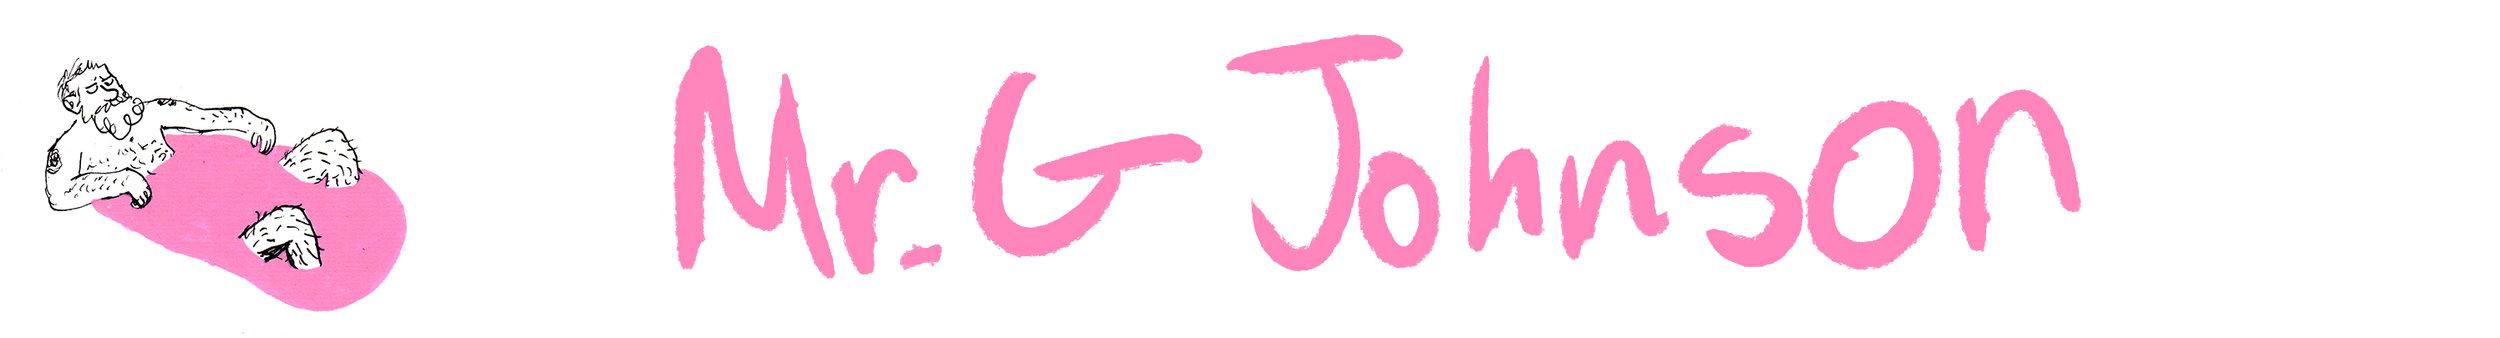 logo long.jpg